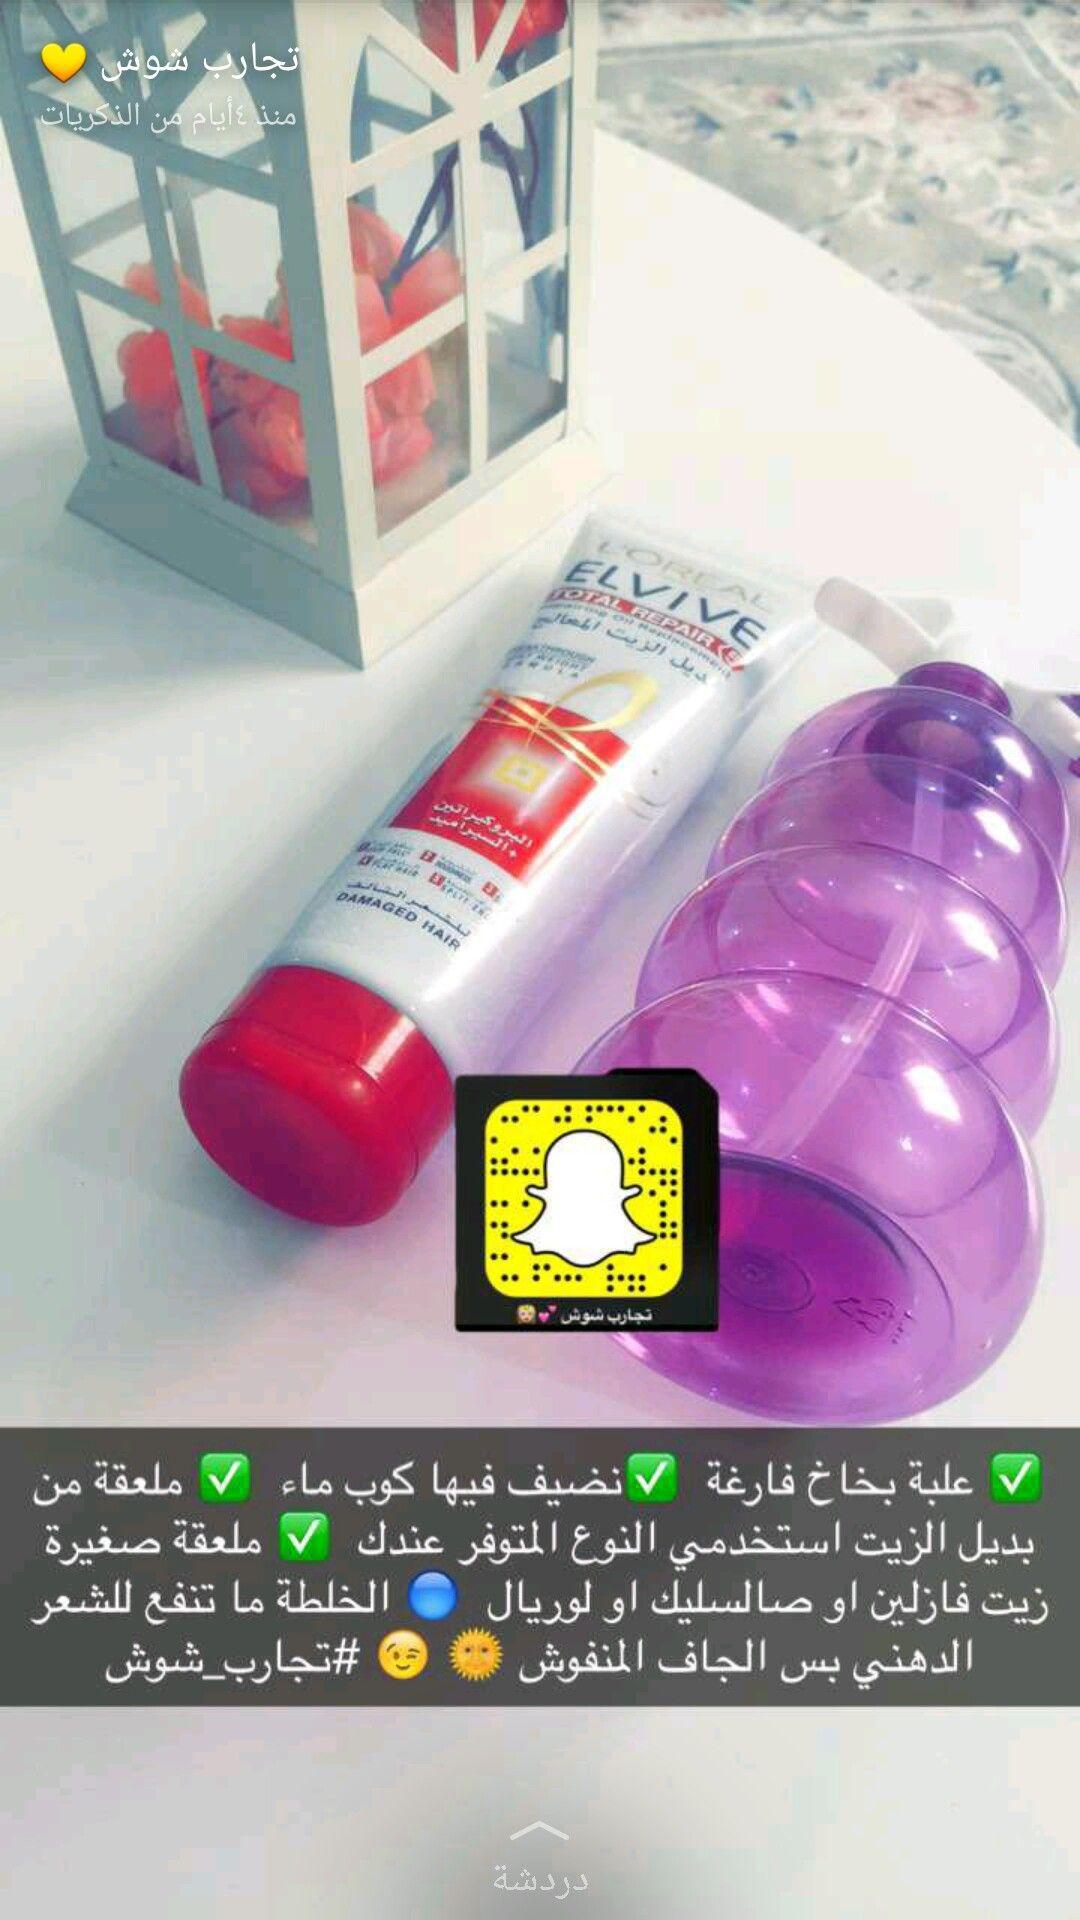 Pour Cheveux Secs خلطة للشعر الجاف Beauty Tips For Glowing Skin Beauty Skin Care Routine Acne Light Therapy